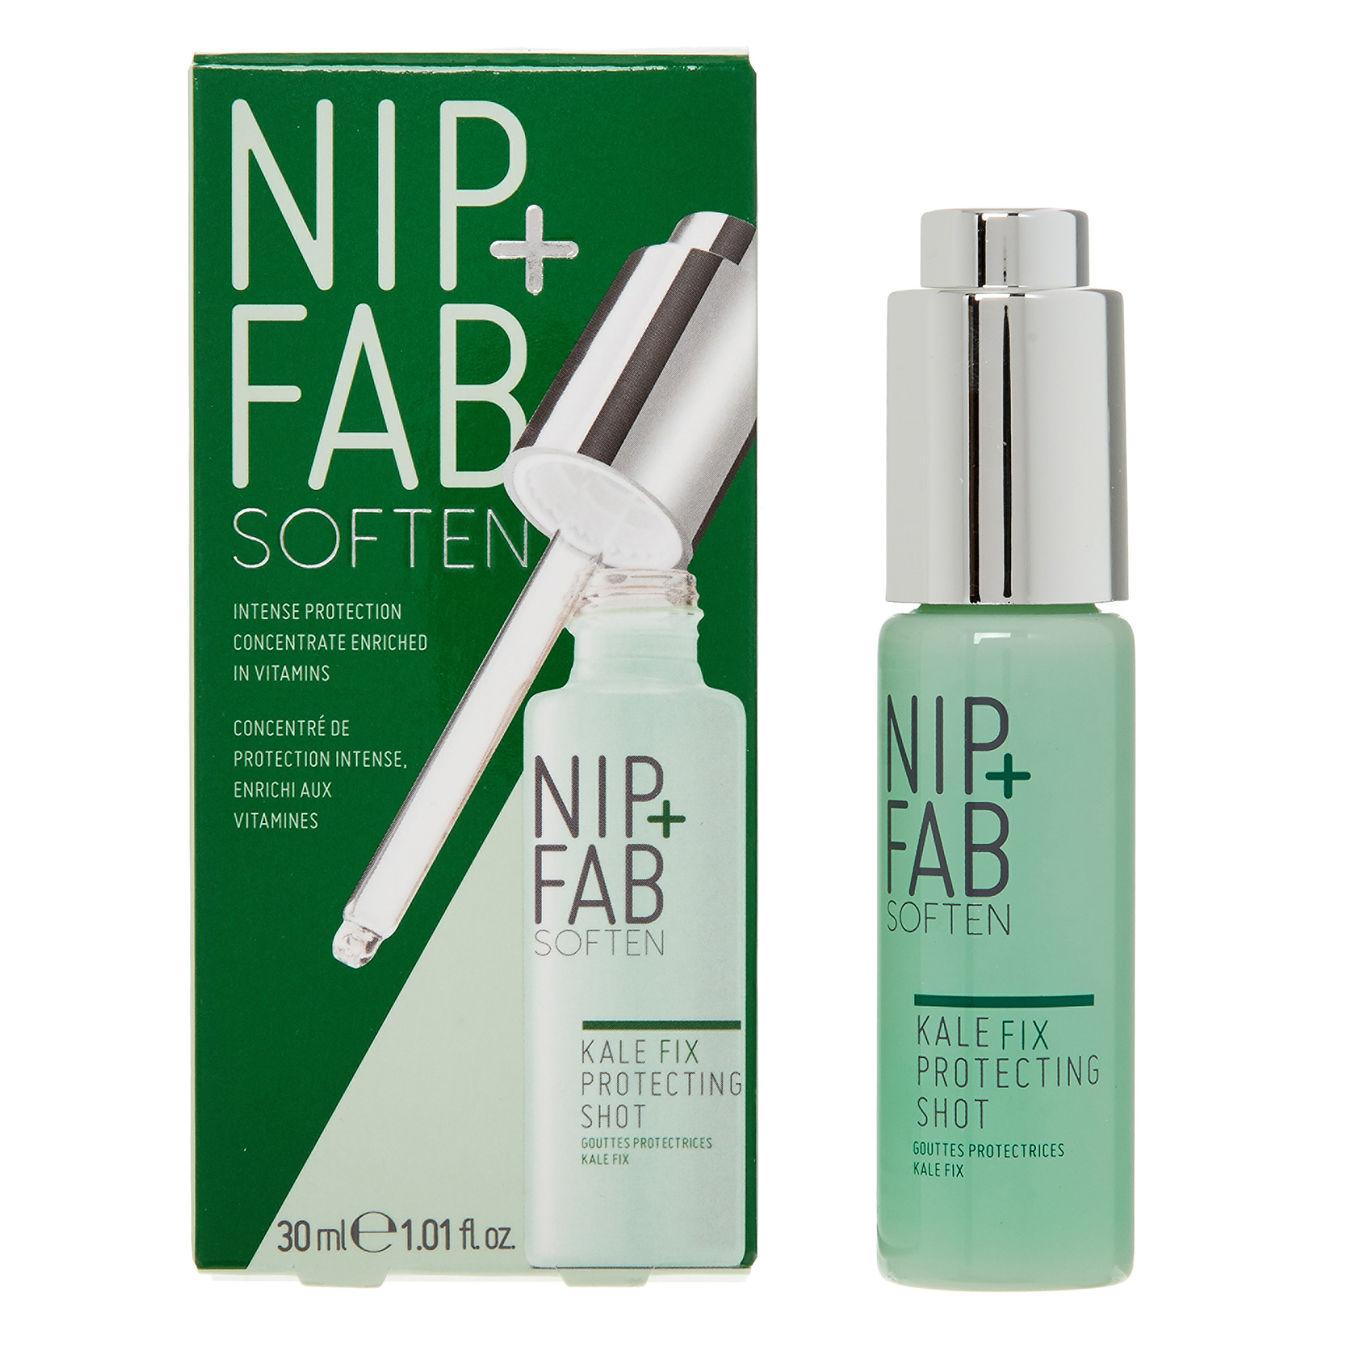 Nip and Fab Soften Kale Fix Protecting Shot 30ml £4.99 @ tkmaxx.com £1.99 c&c